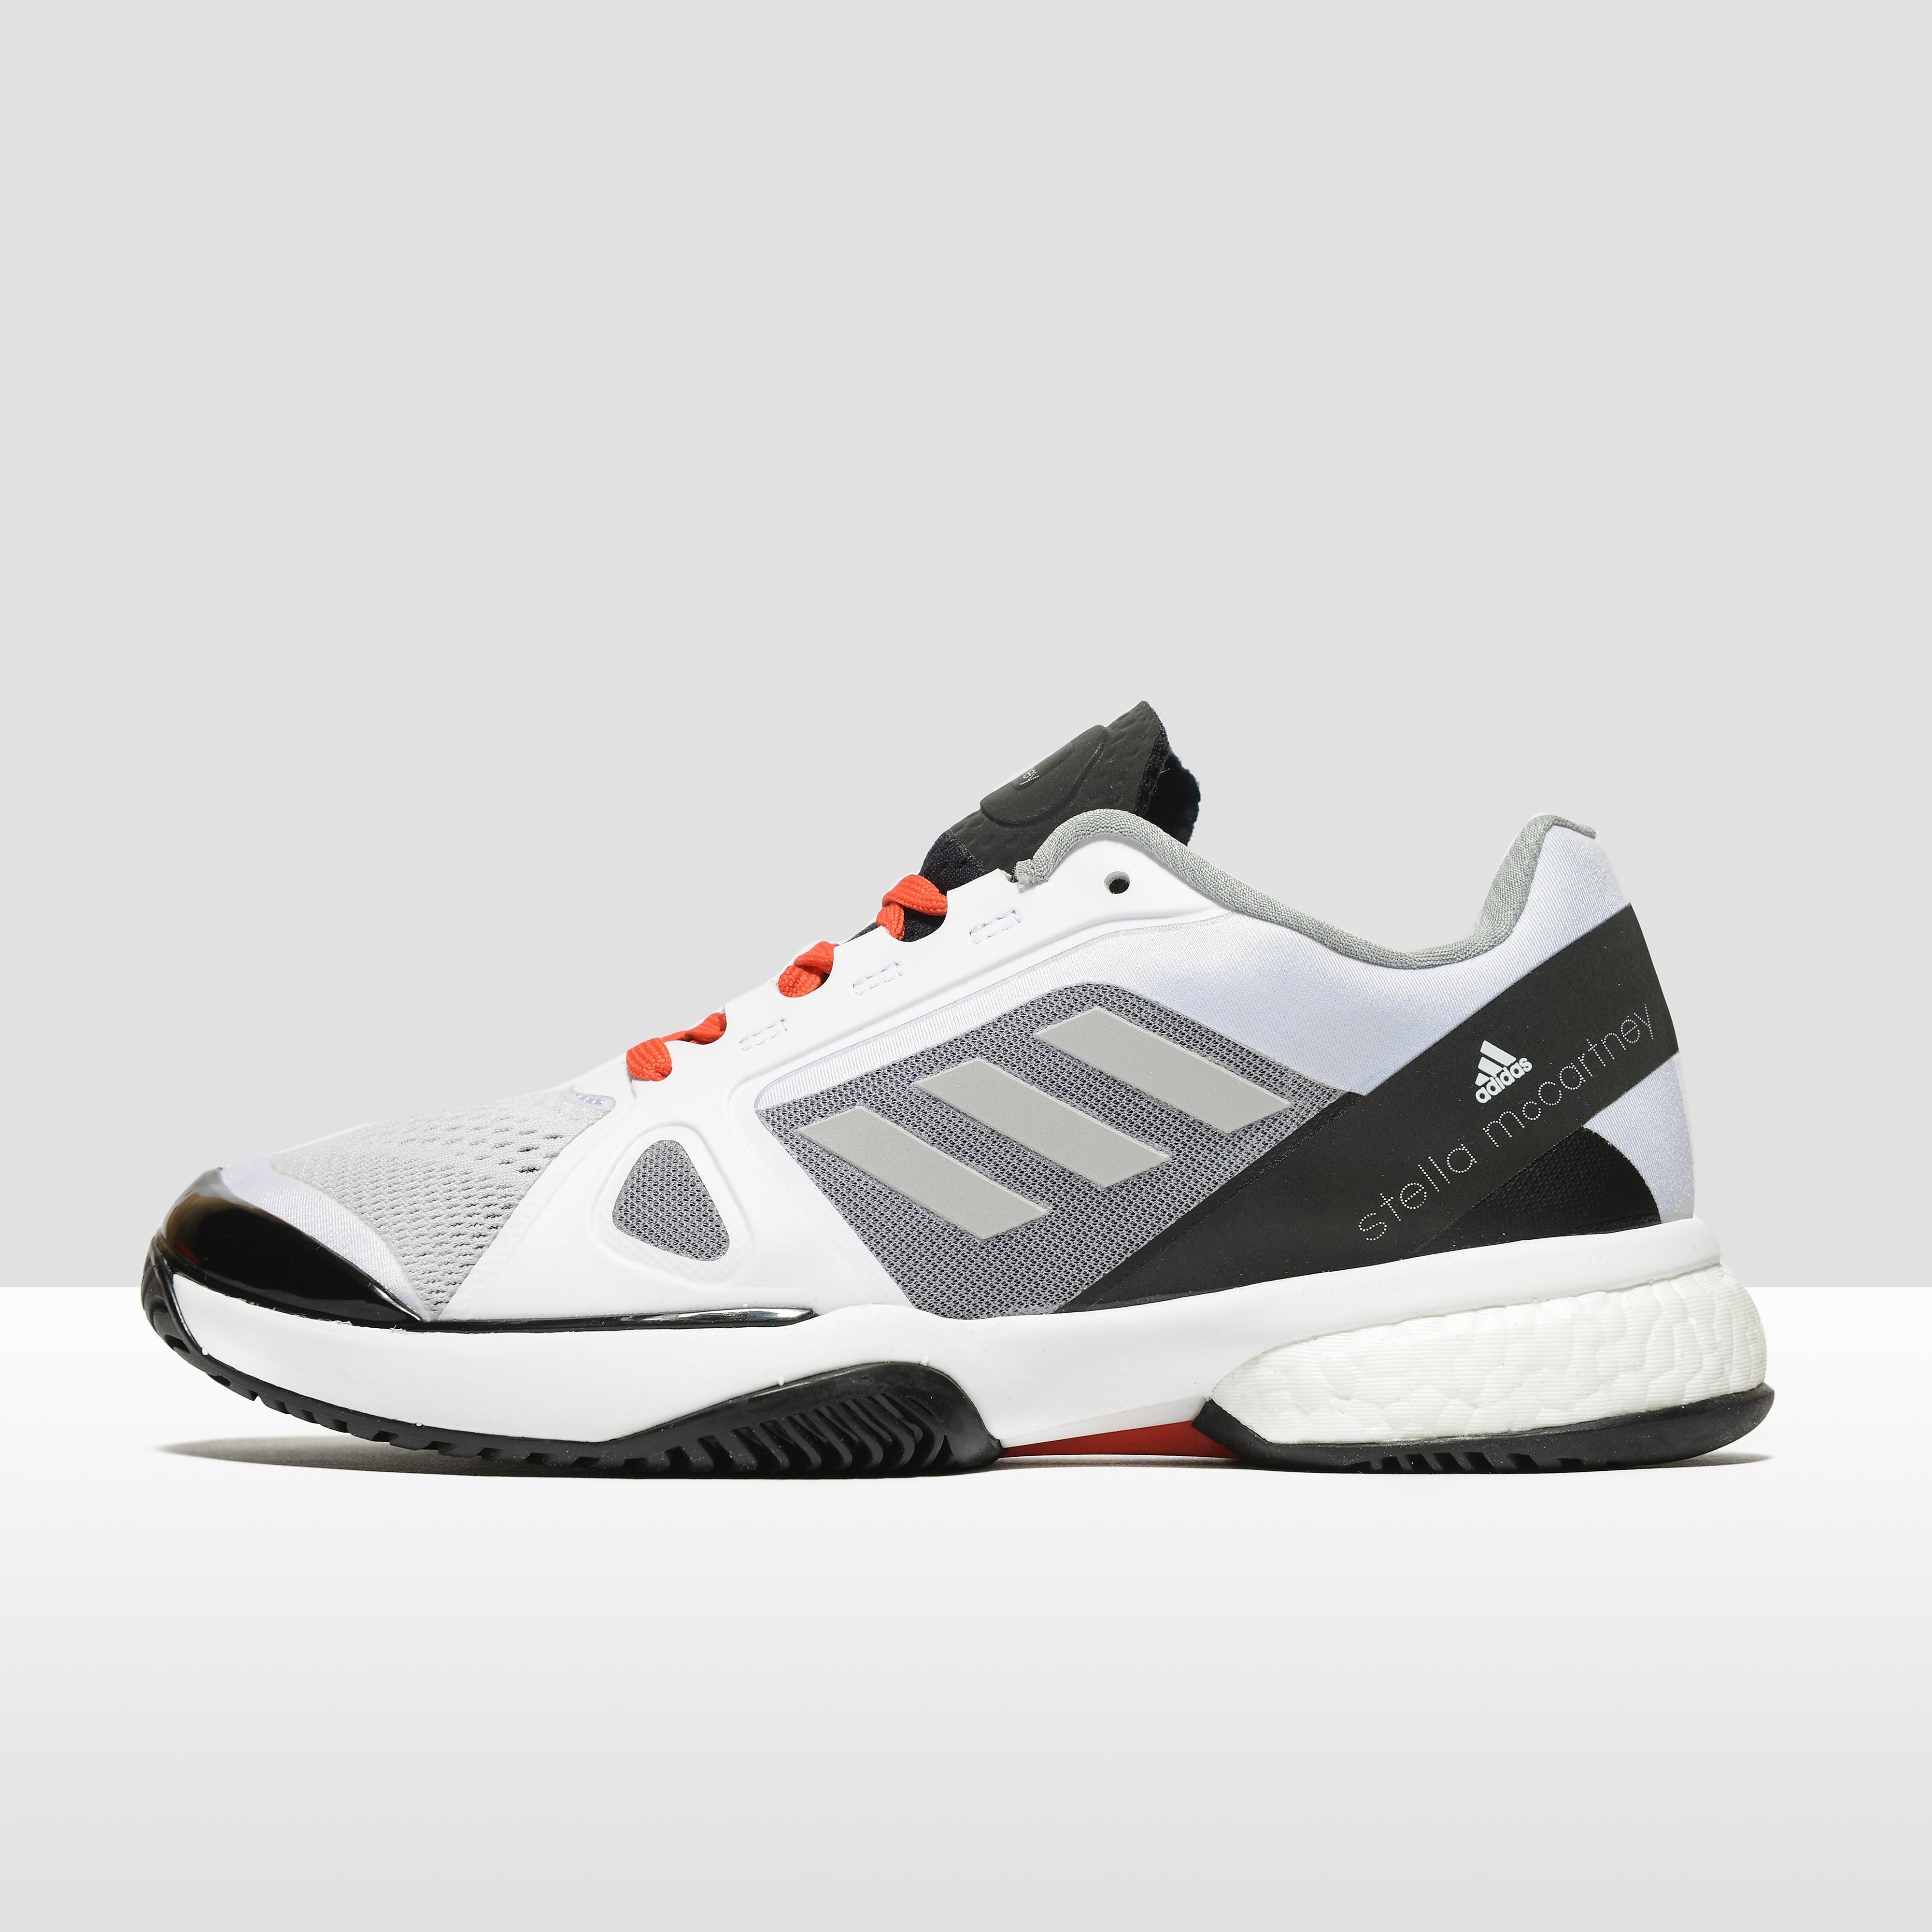 adidas Barricade Boost 2017 Women's Tennis Shoes